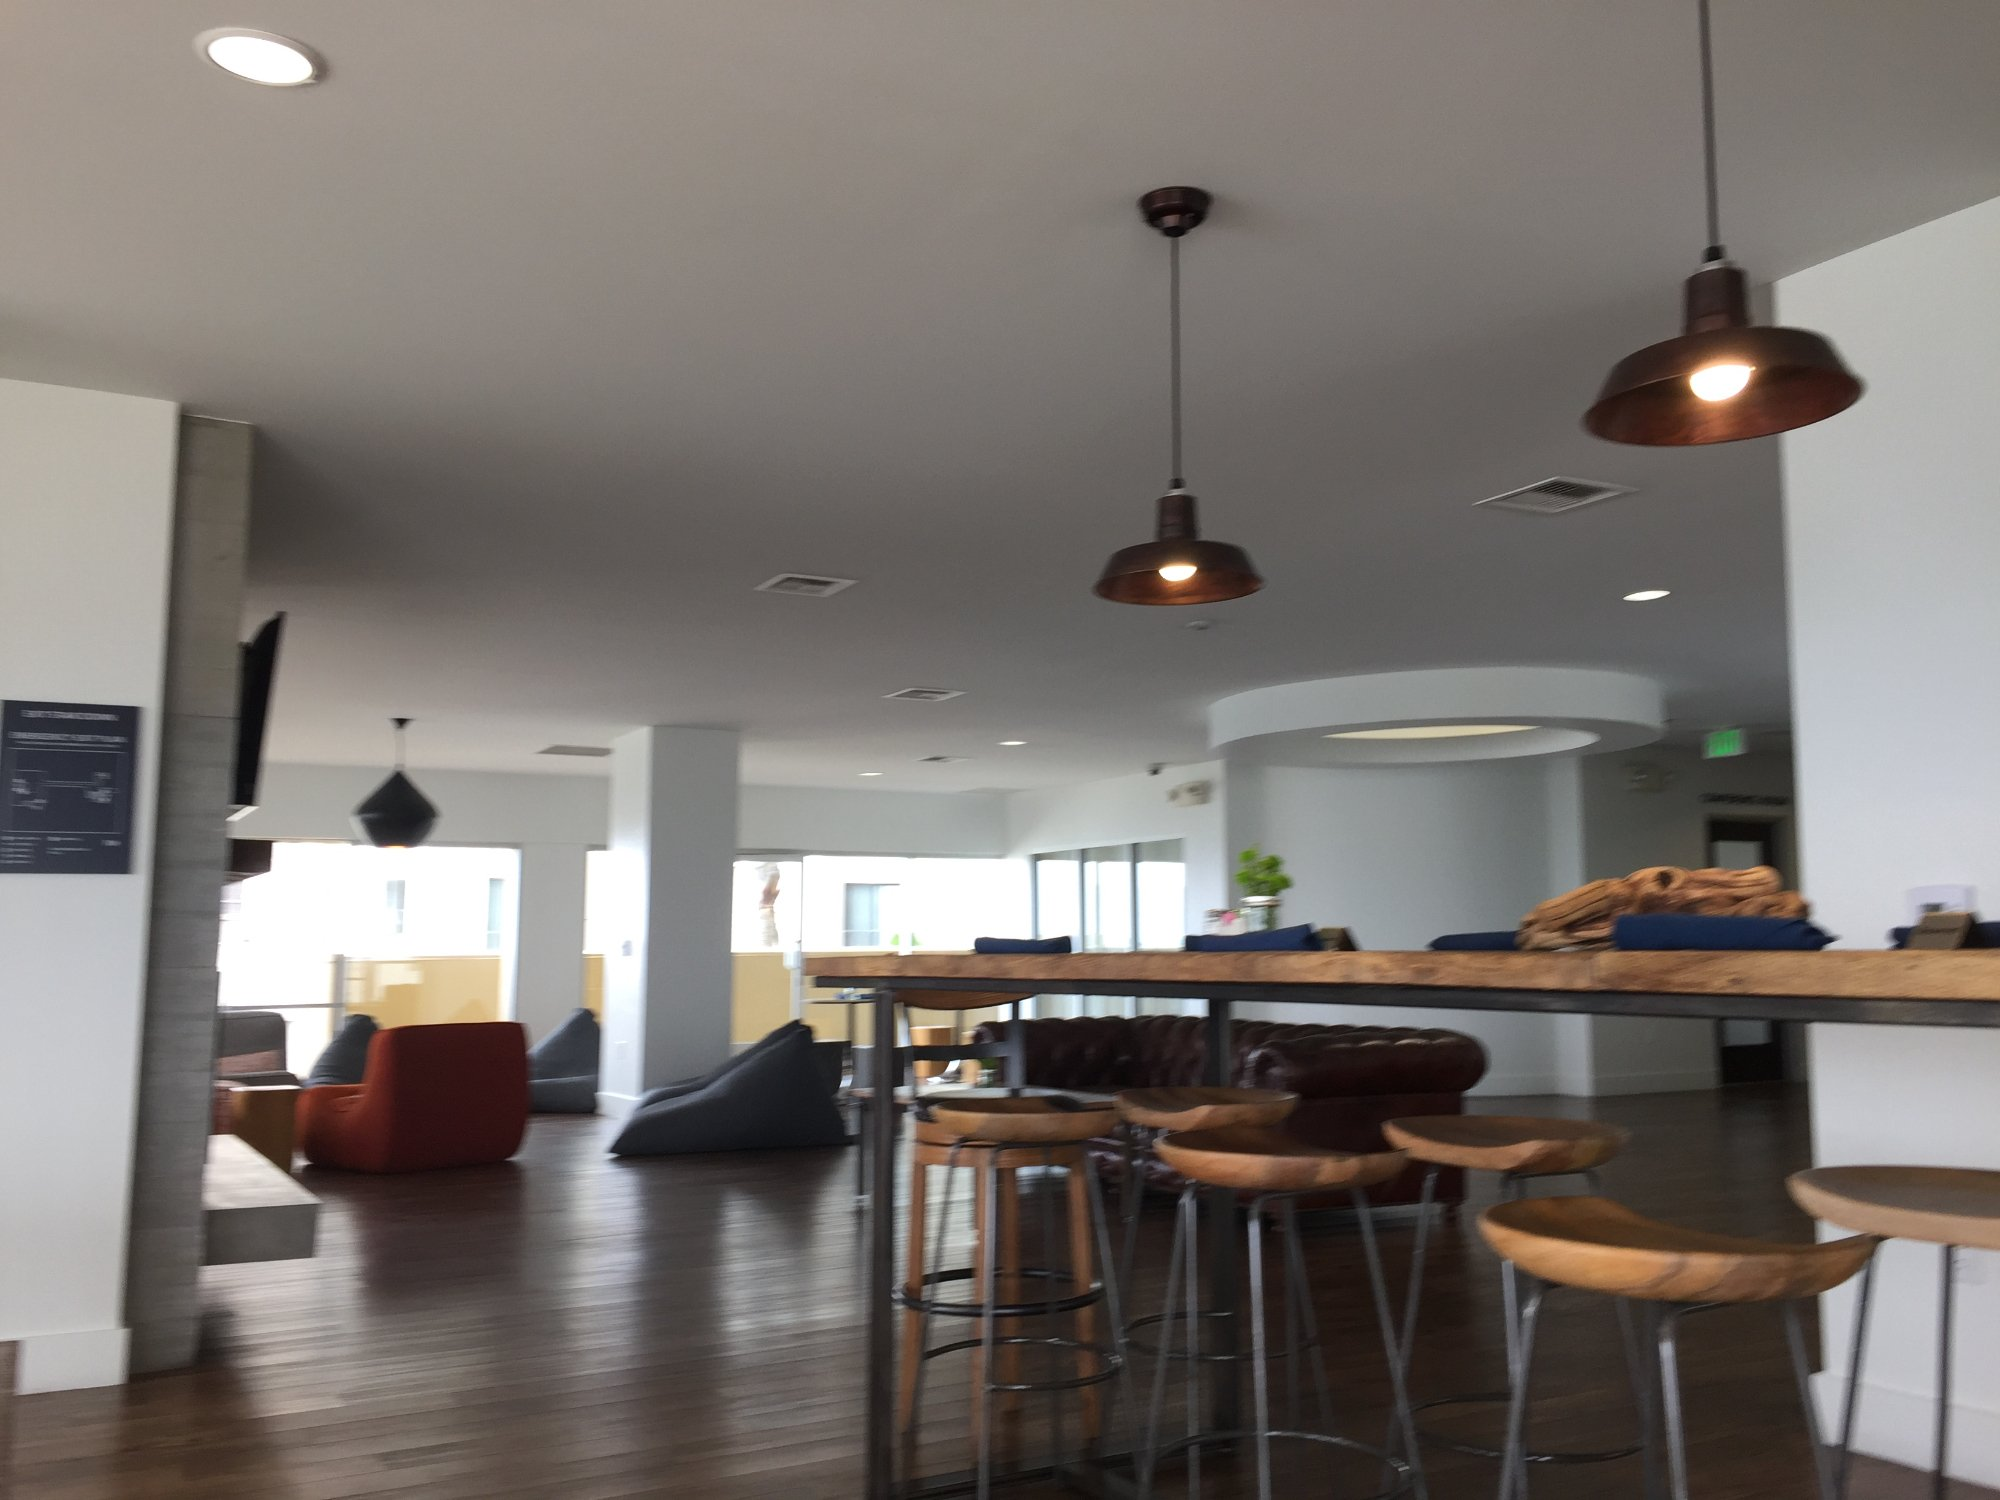 plunge cafe, long beach - restaurant reviews & photos - tripadvisor